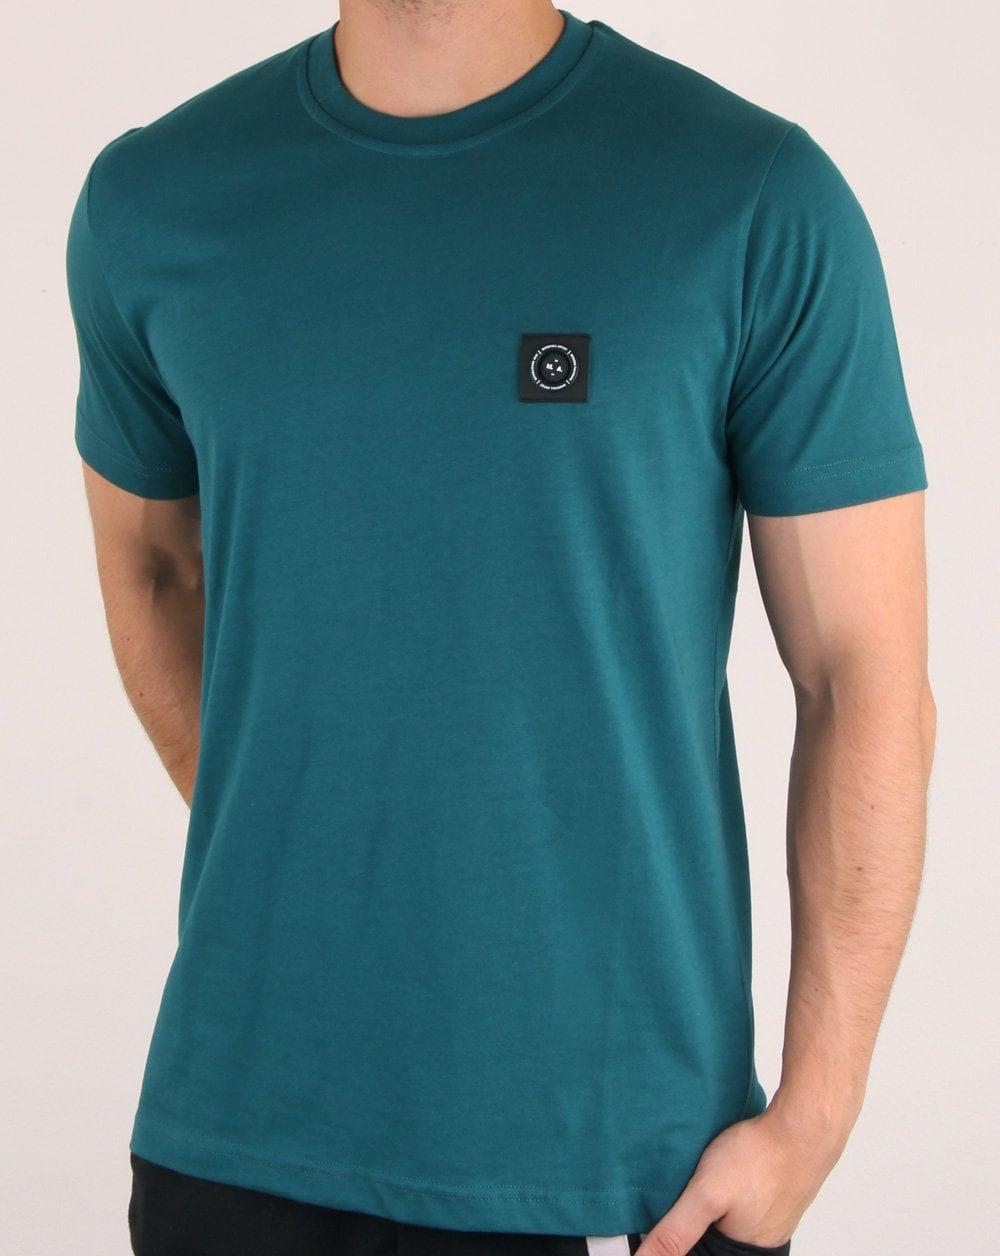 48f1b55e2ec32 Marshall Artist Short Sleeve Siren T-shirt Teal